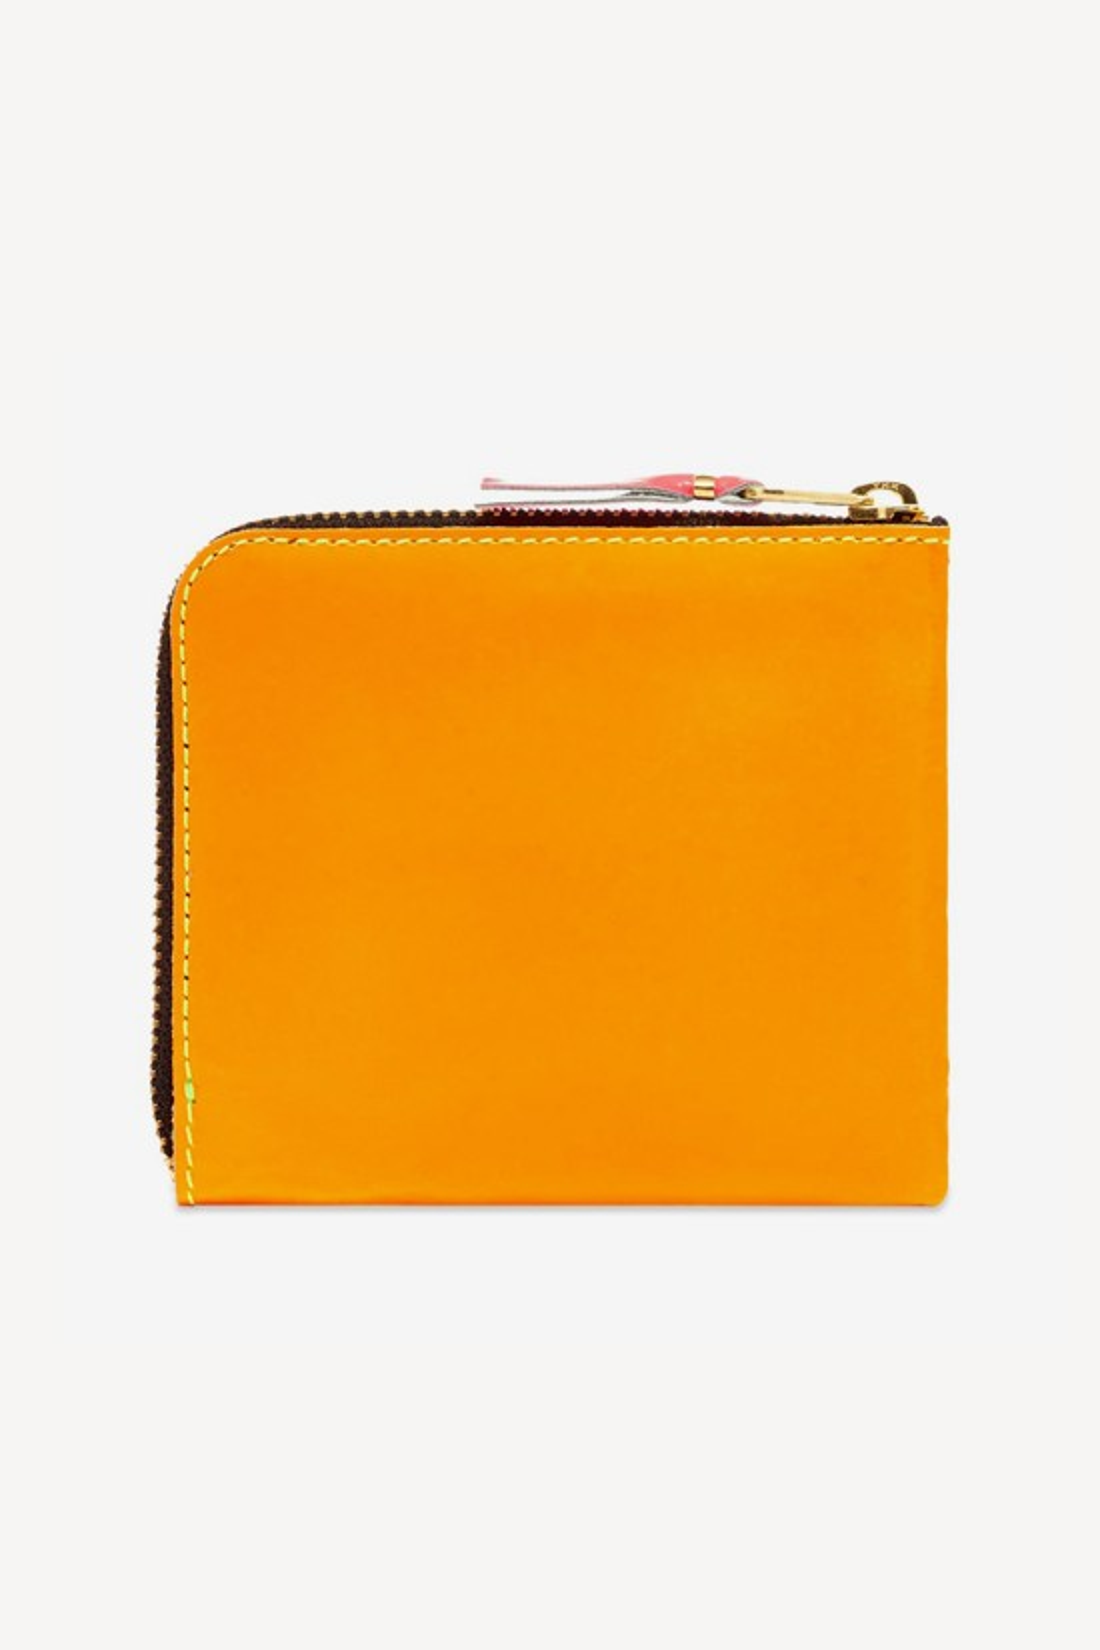 COMME DES GARÇONS WALLETS / Cdg classic leather wallet Yellow light orange